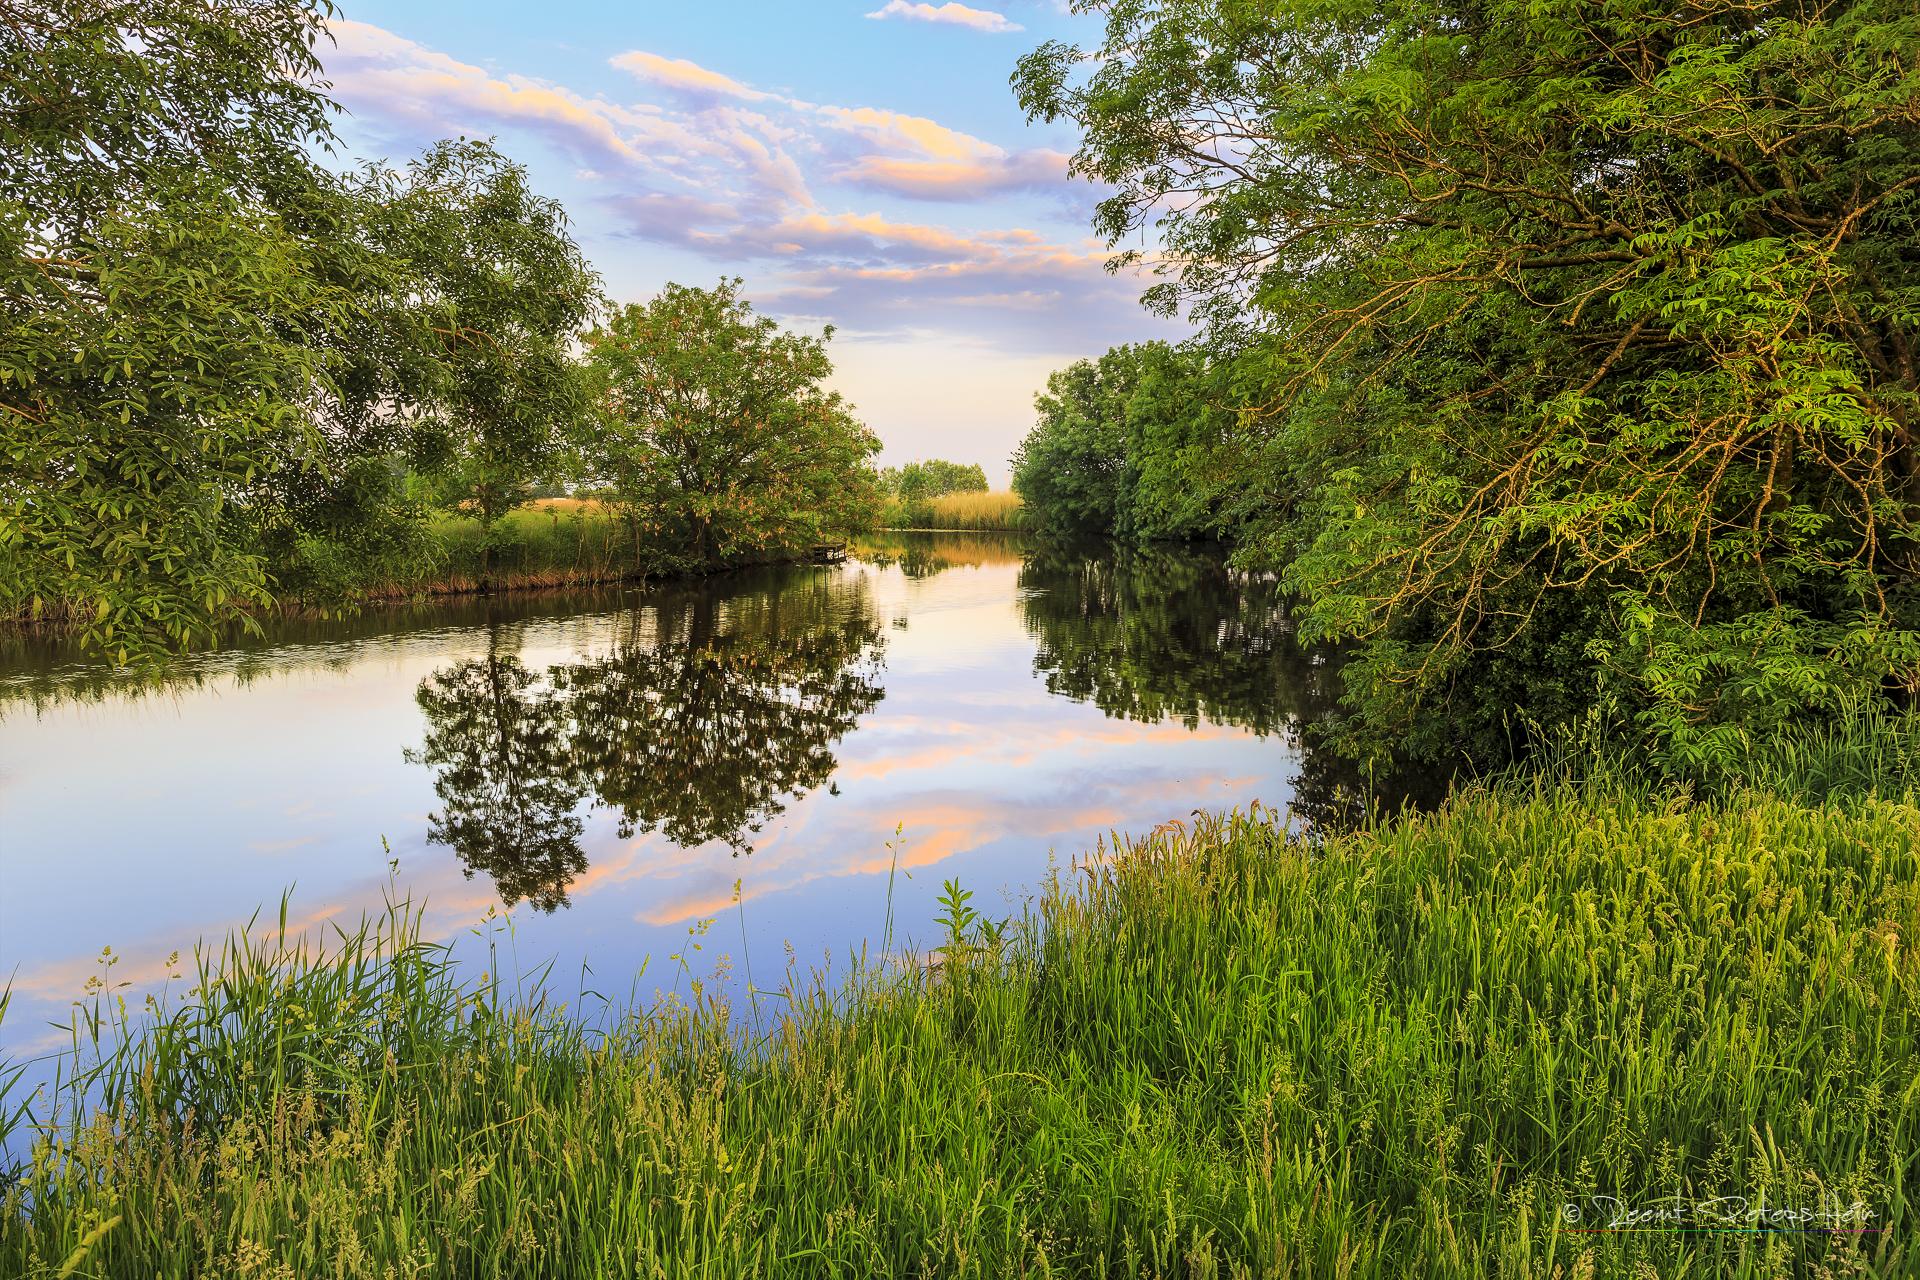 River Harle, Germany